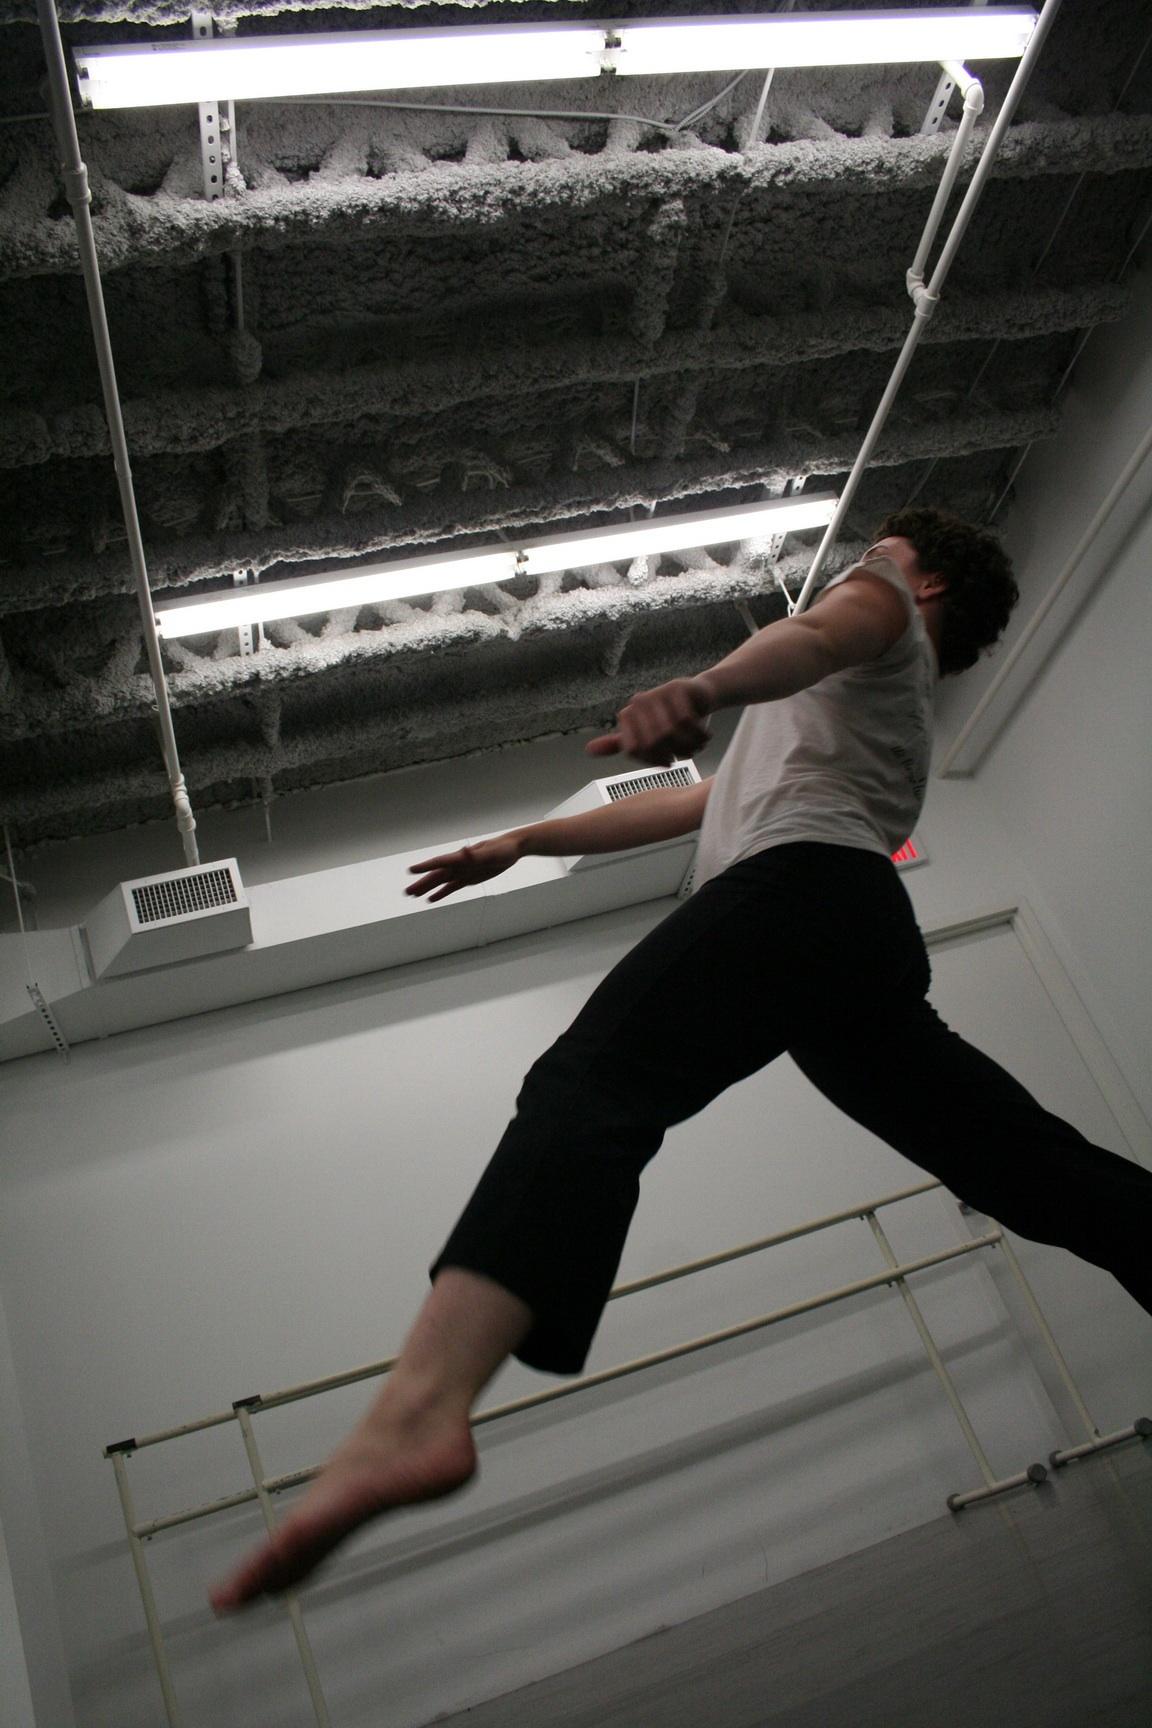 rehearsal 07.01 - laurel slanted (in motion).jpg